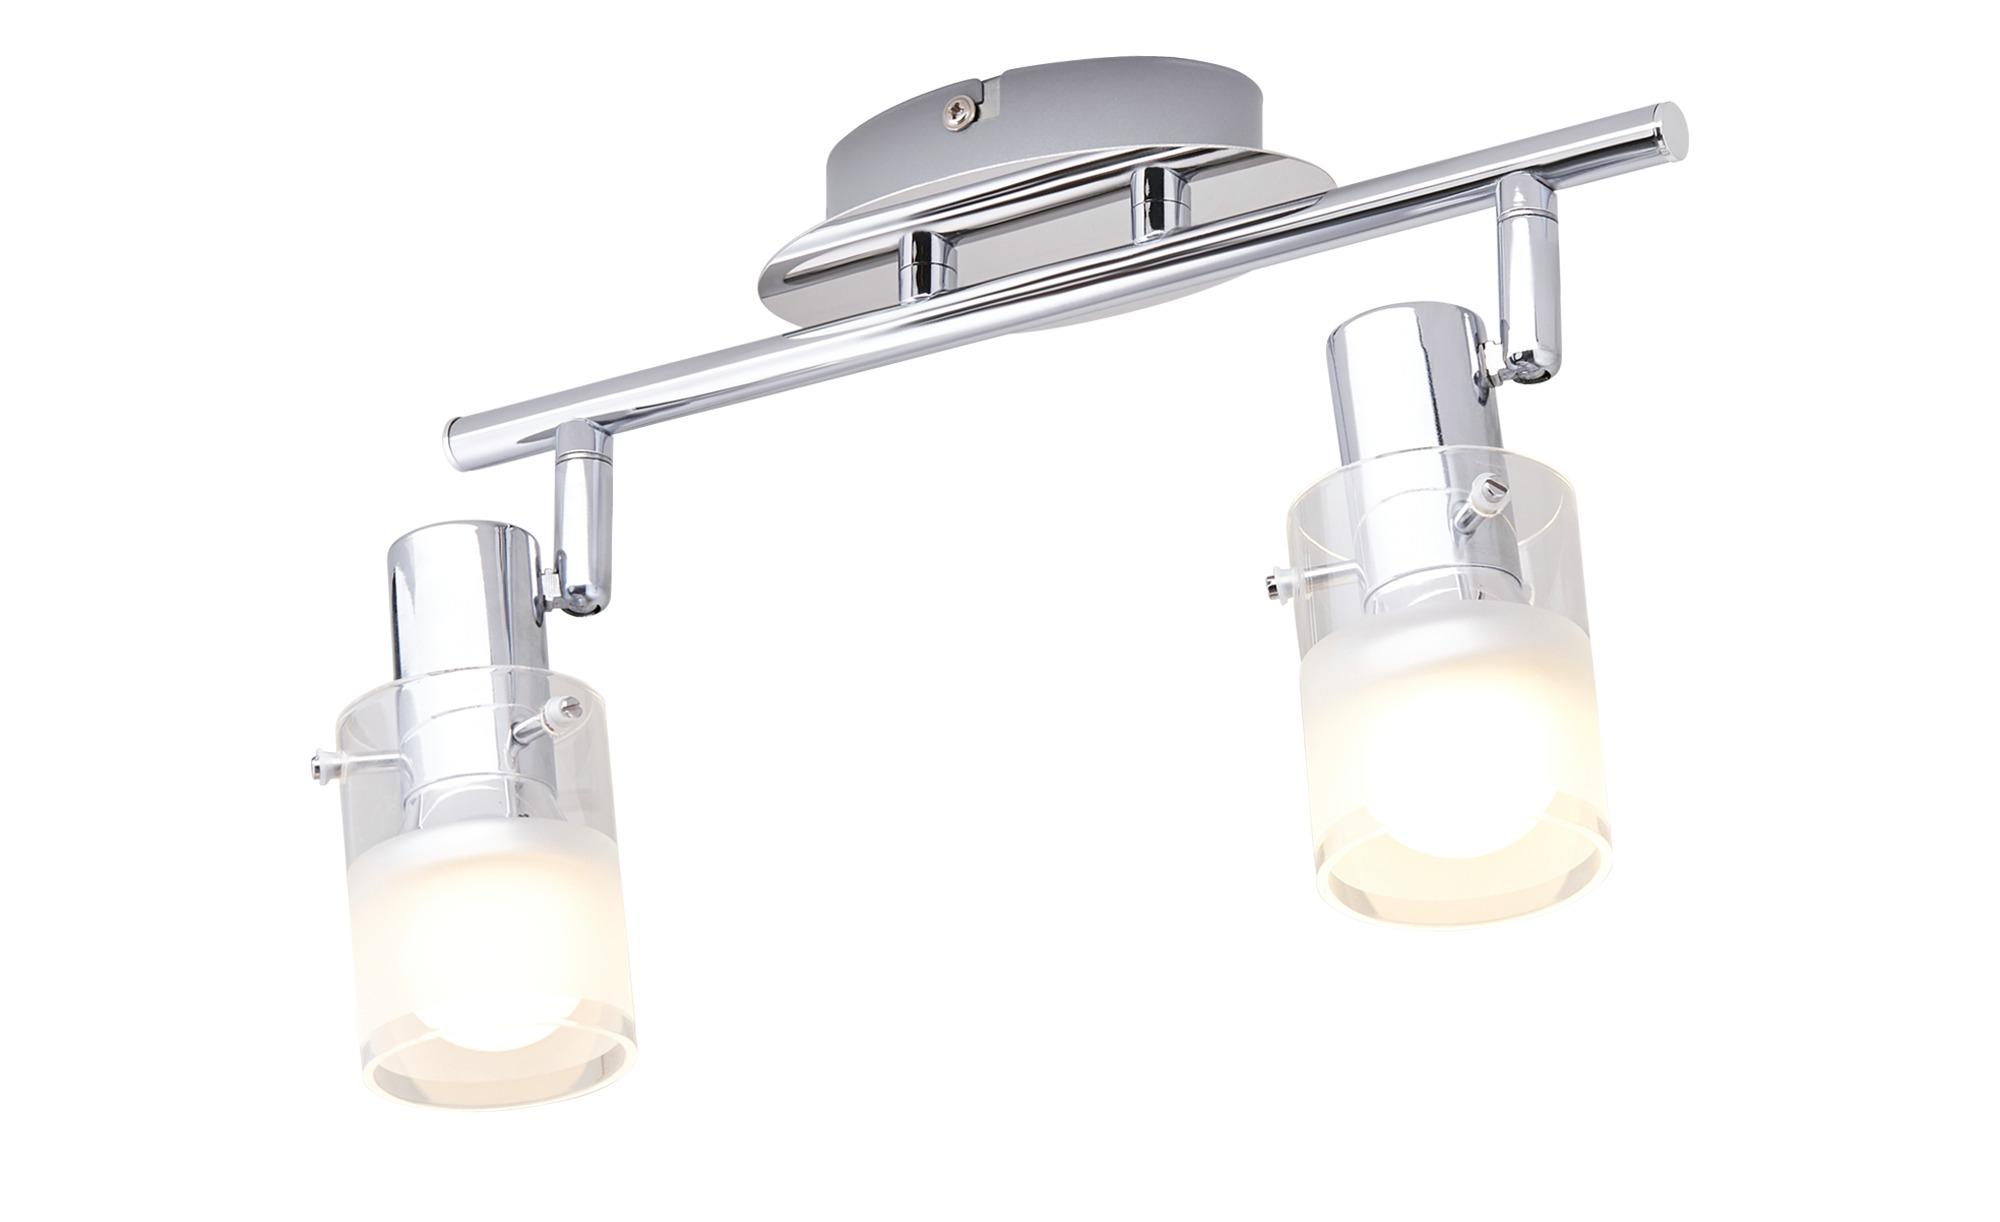 KHG LED-Deckenstrahler, 2-flammig Glas teilsatiniert ¦ Maße (cm): B: 8 H: 12 Lampen & Leuchten > LED-Leuchten > LED-Strahler & Spots - Höffner